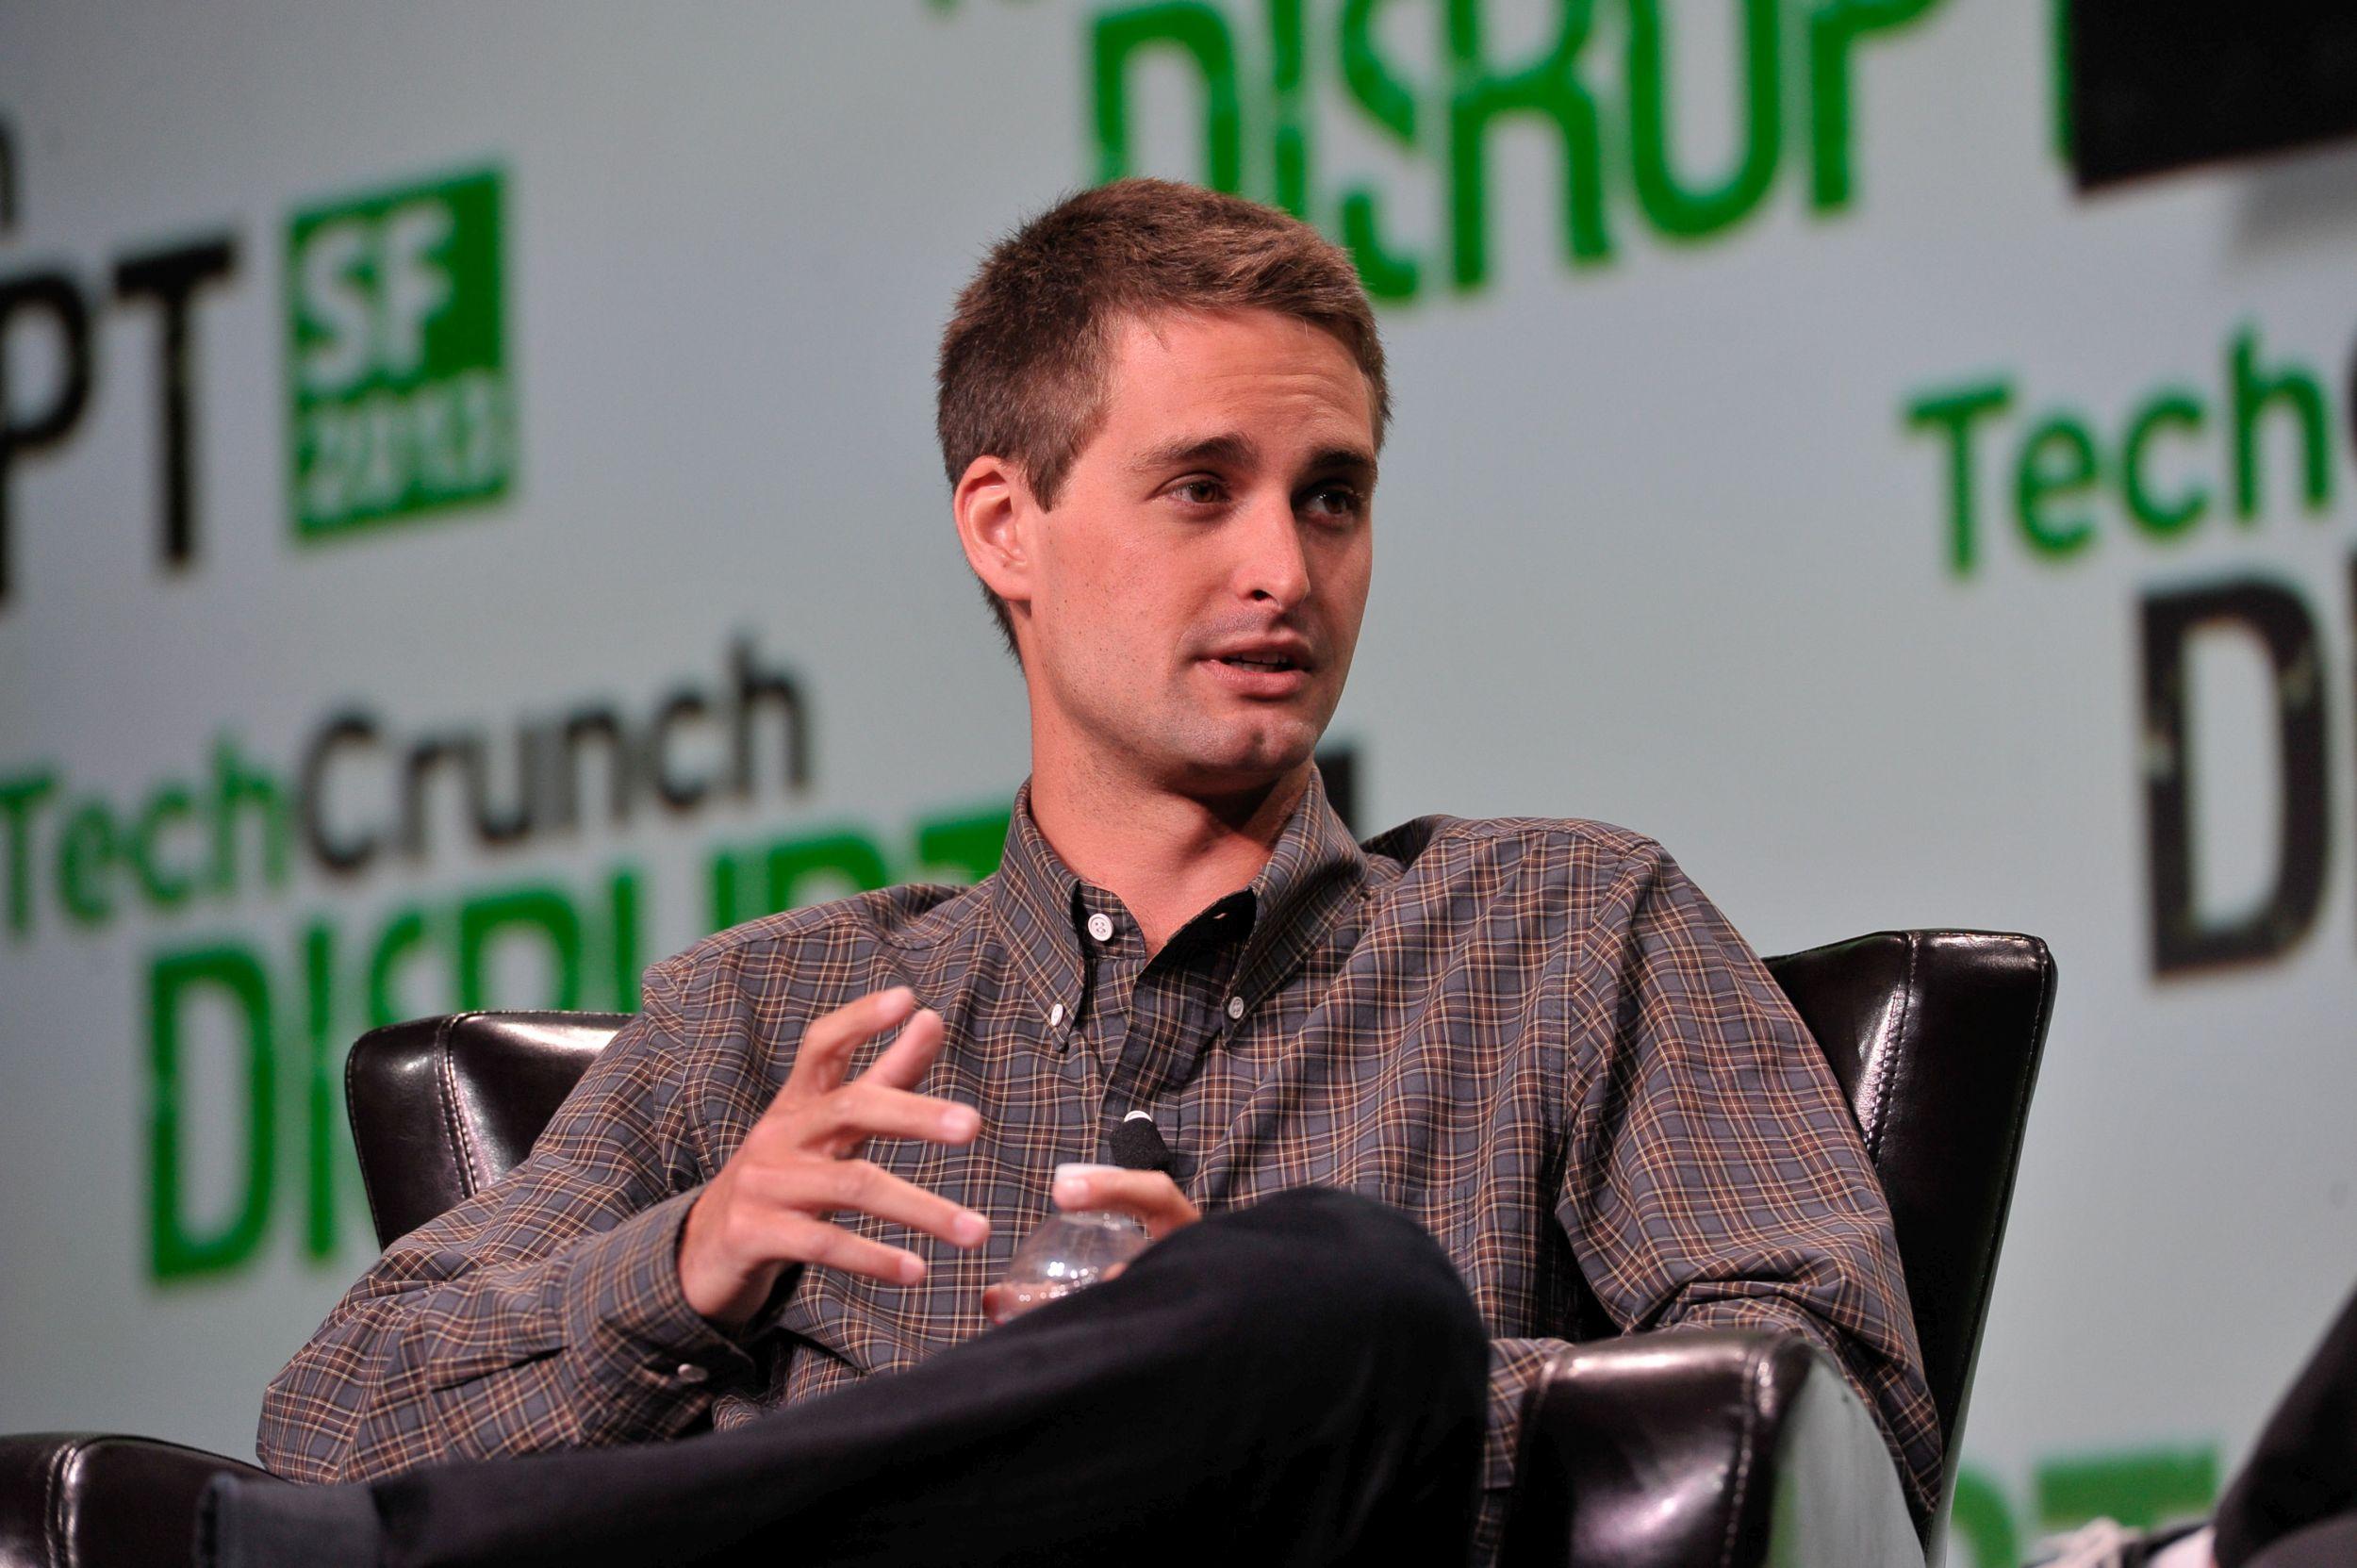 Evan Spiegel, twórca Snapchata (fot. TechCrunch / Steve Jennings / bit.ly/1IKSroU / CC BY / bit.ly/1mhaR6e)